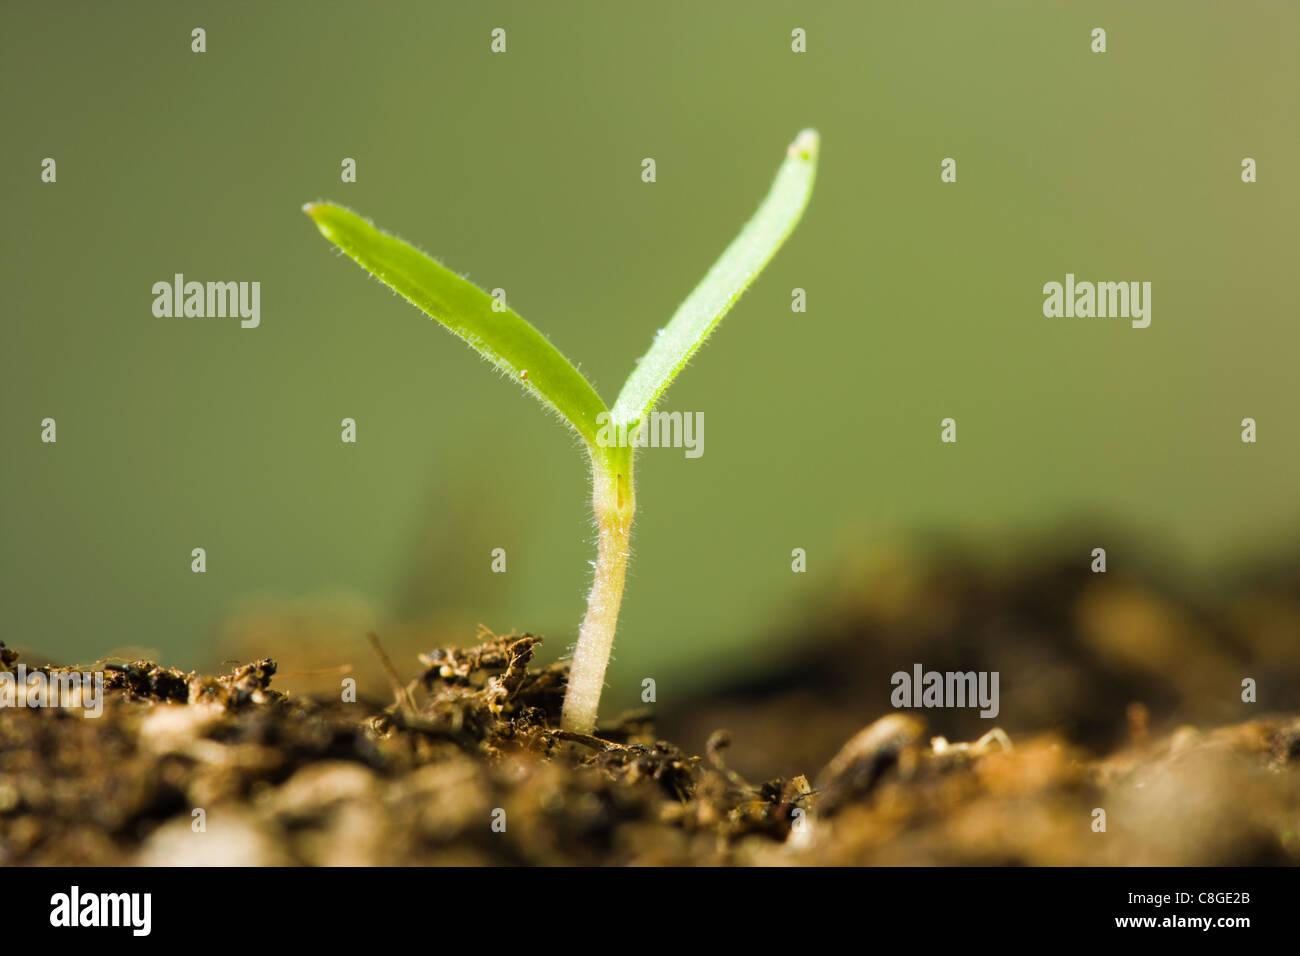 Seedling. Dicotyledon germinating. - Stock Image